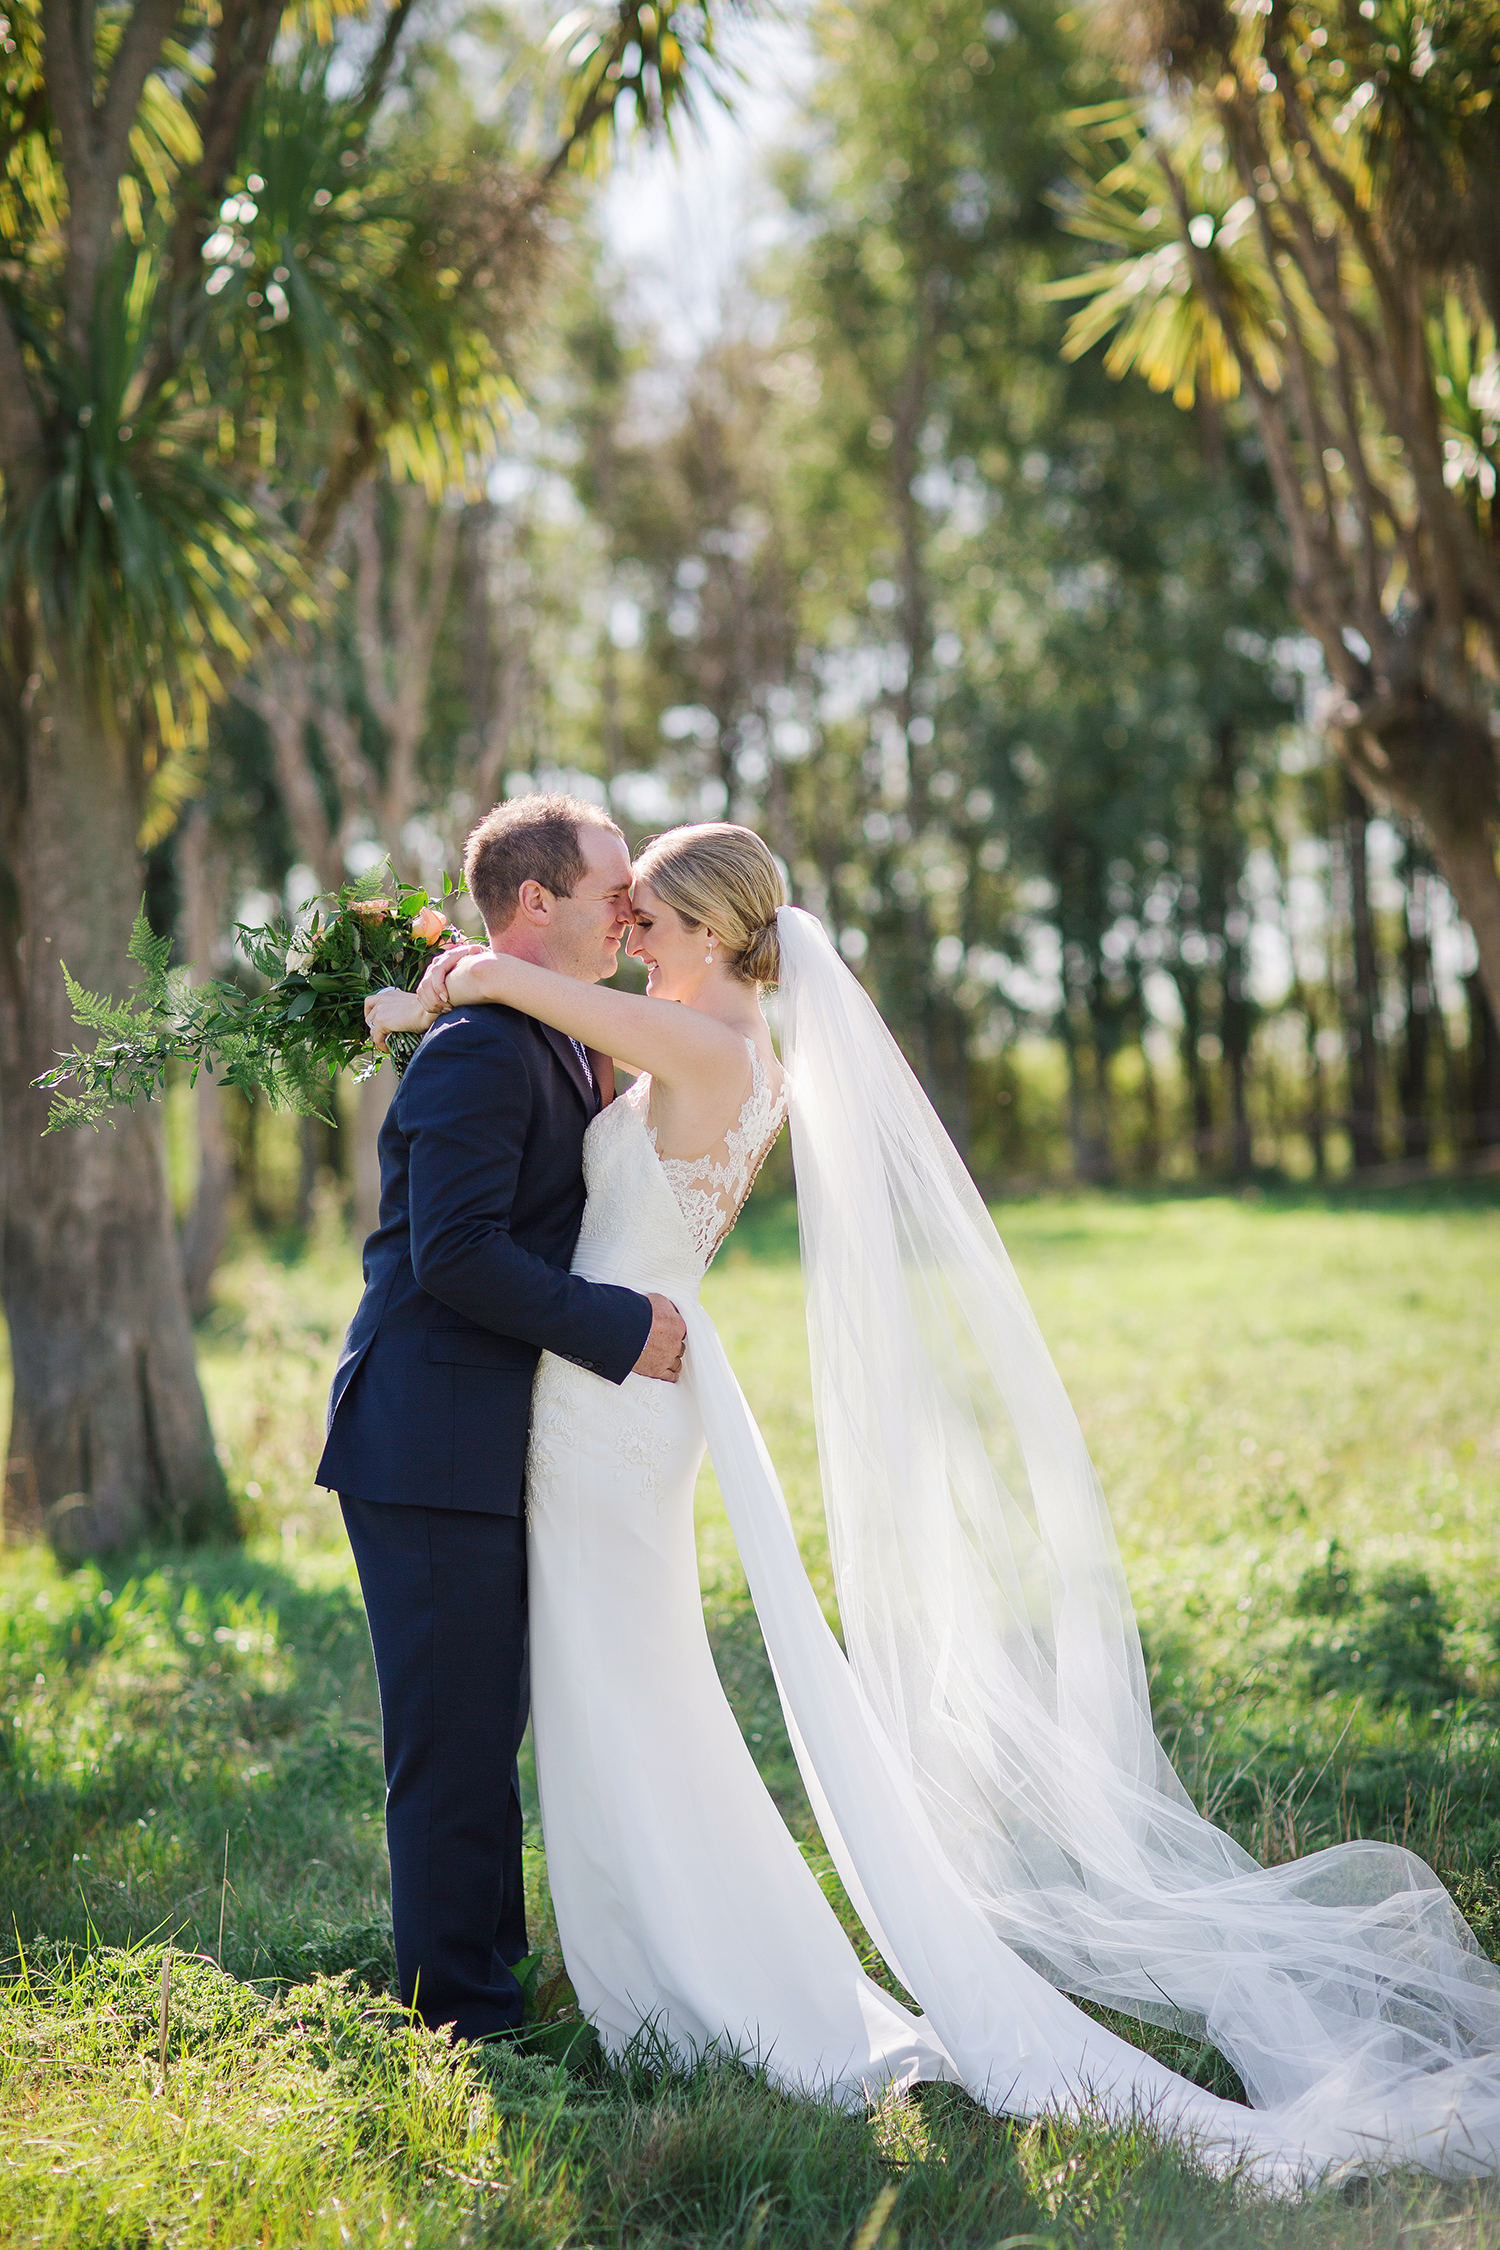 Toni-Larsen-Katie+Willy-Wedding-18.jpg